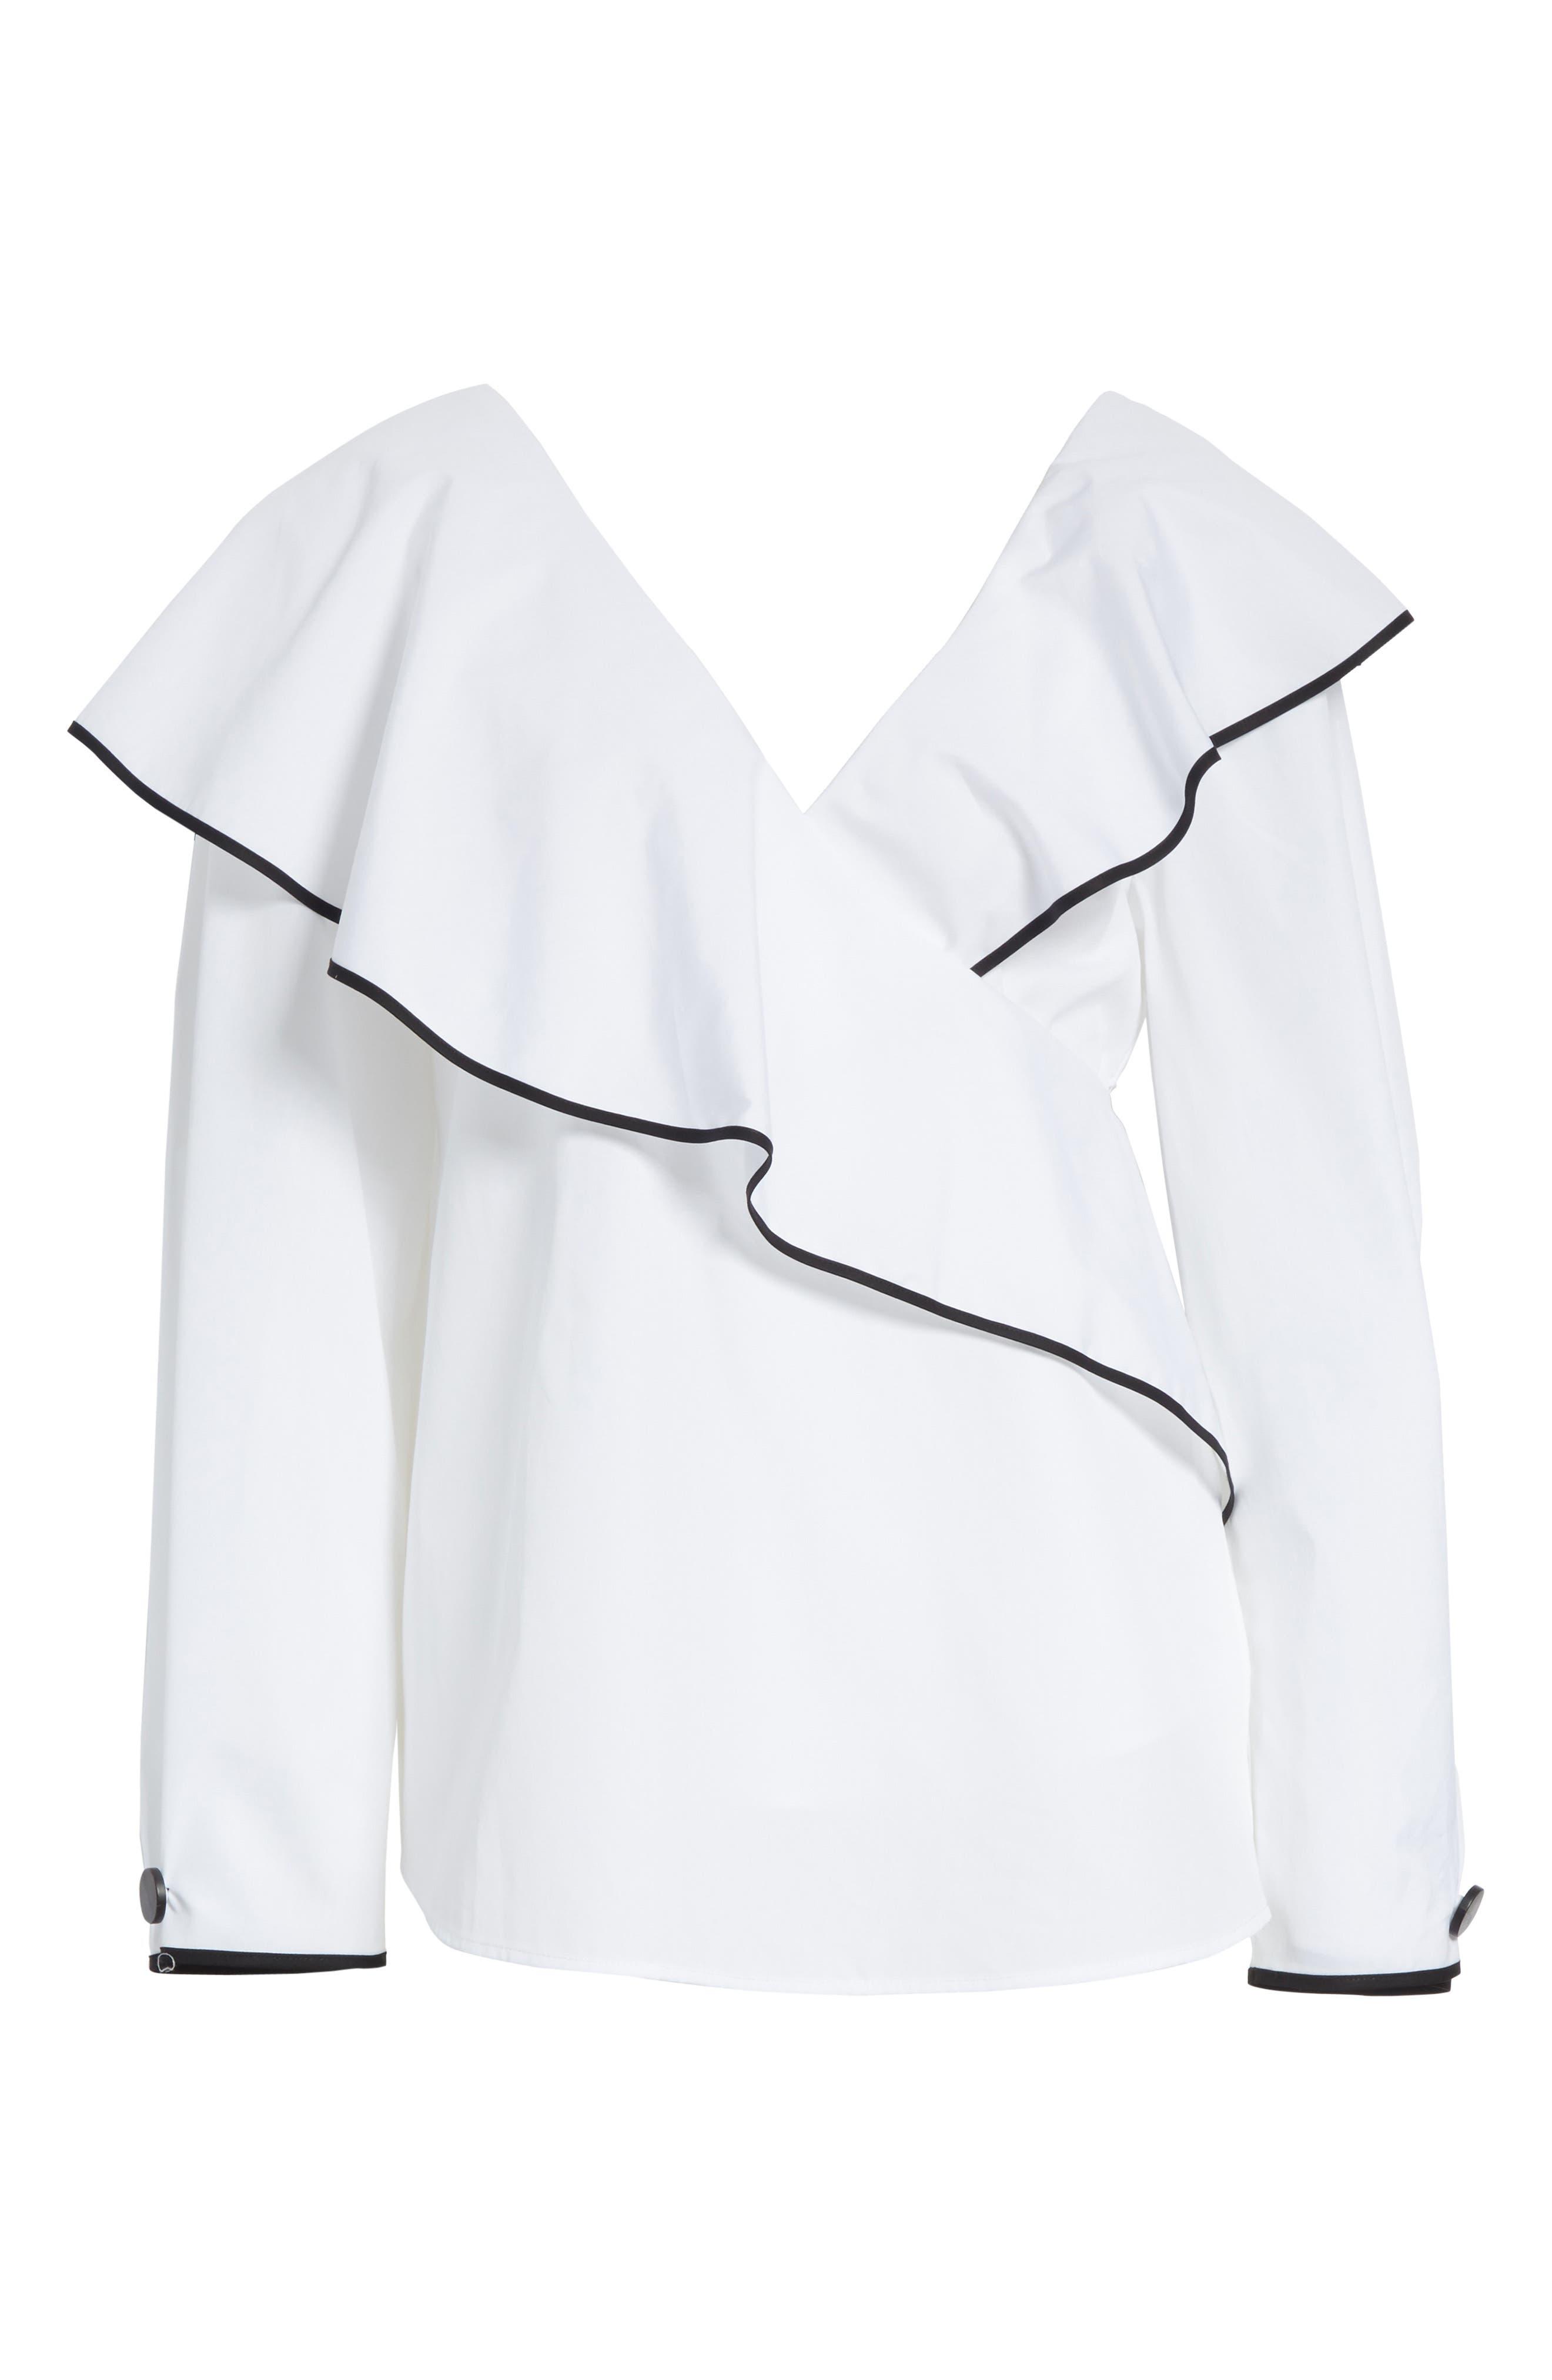 Diane von Furstenberg Piped Ruffled Poplin Blouse,                             Alternate thumbnail 6, color,                             White